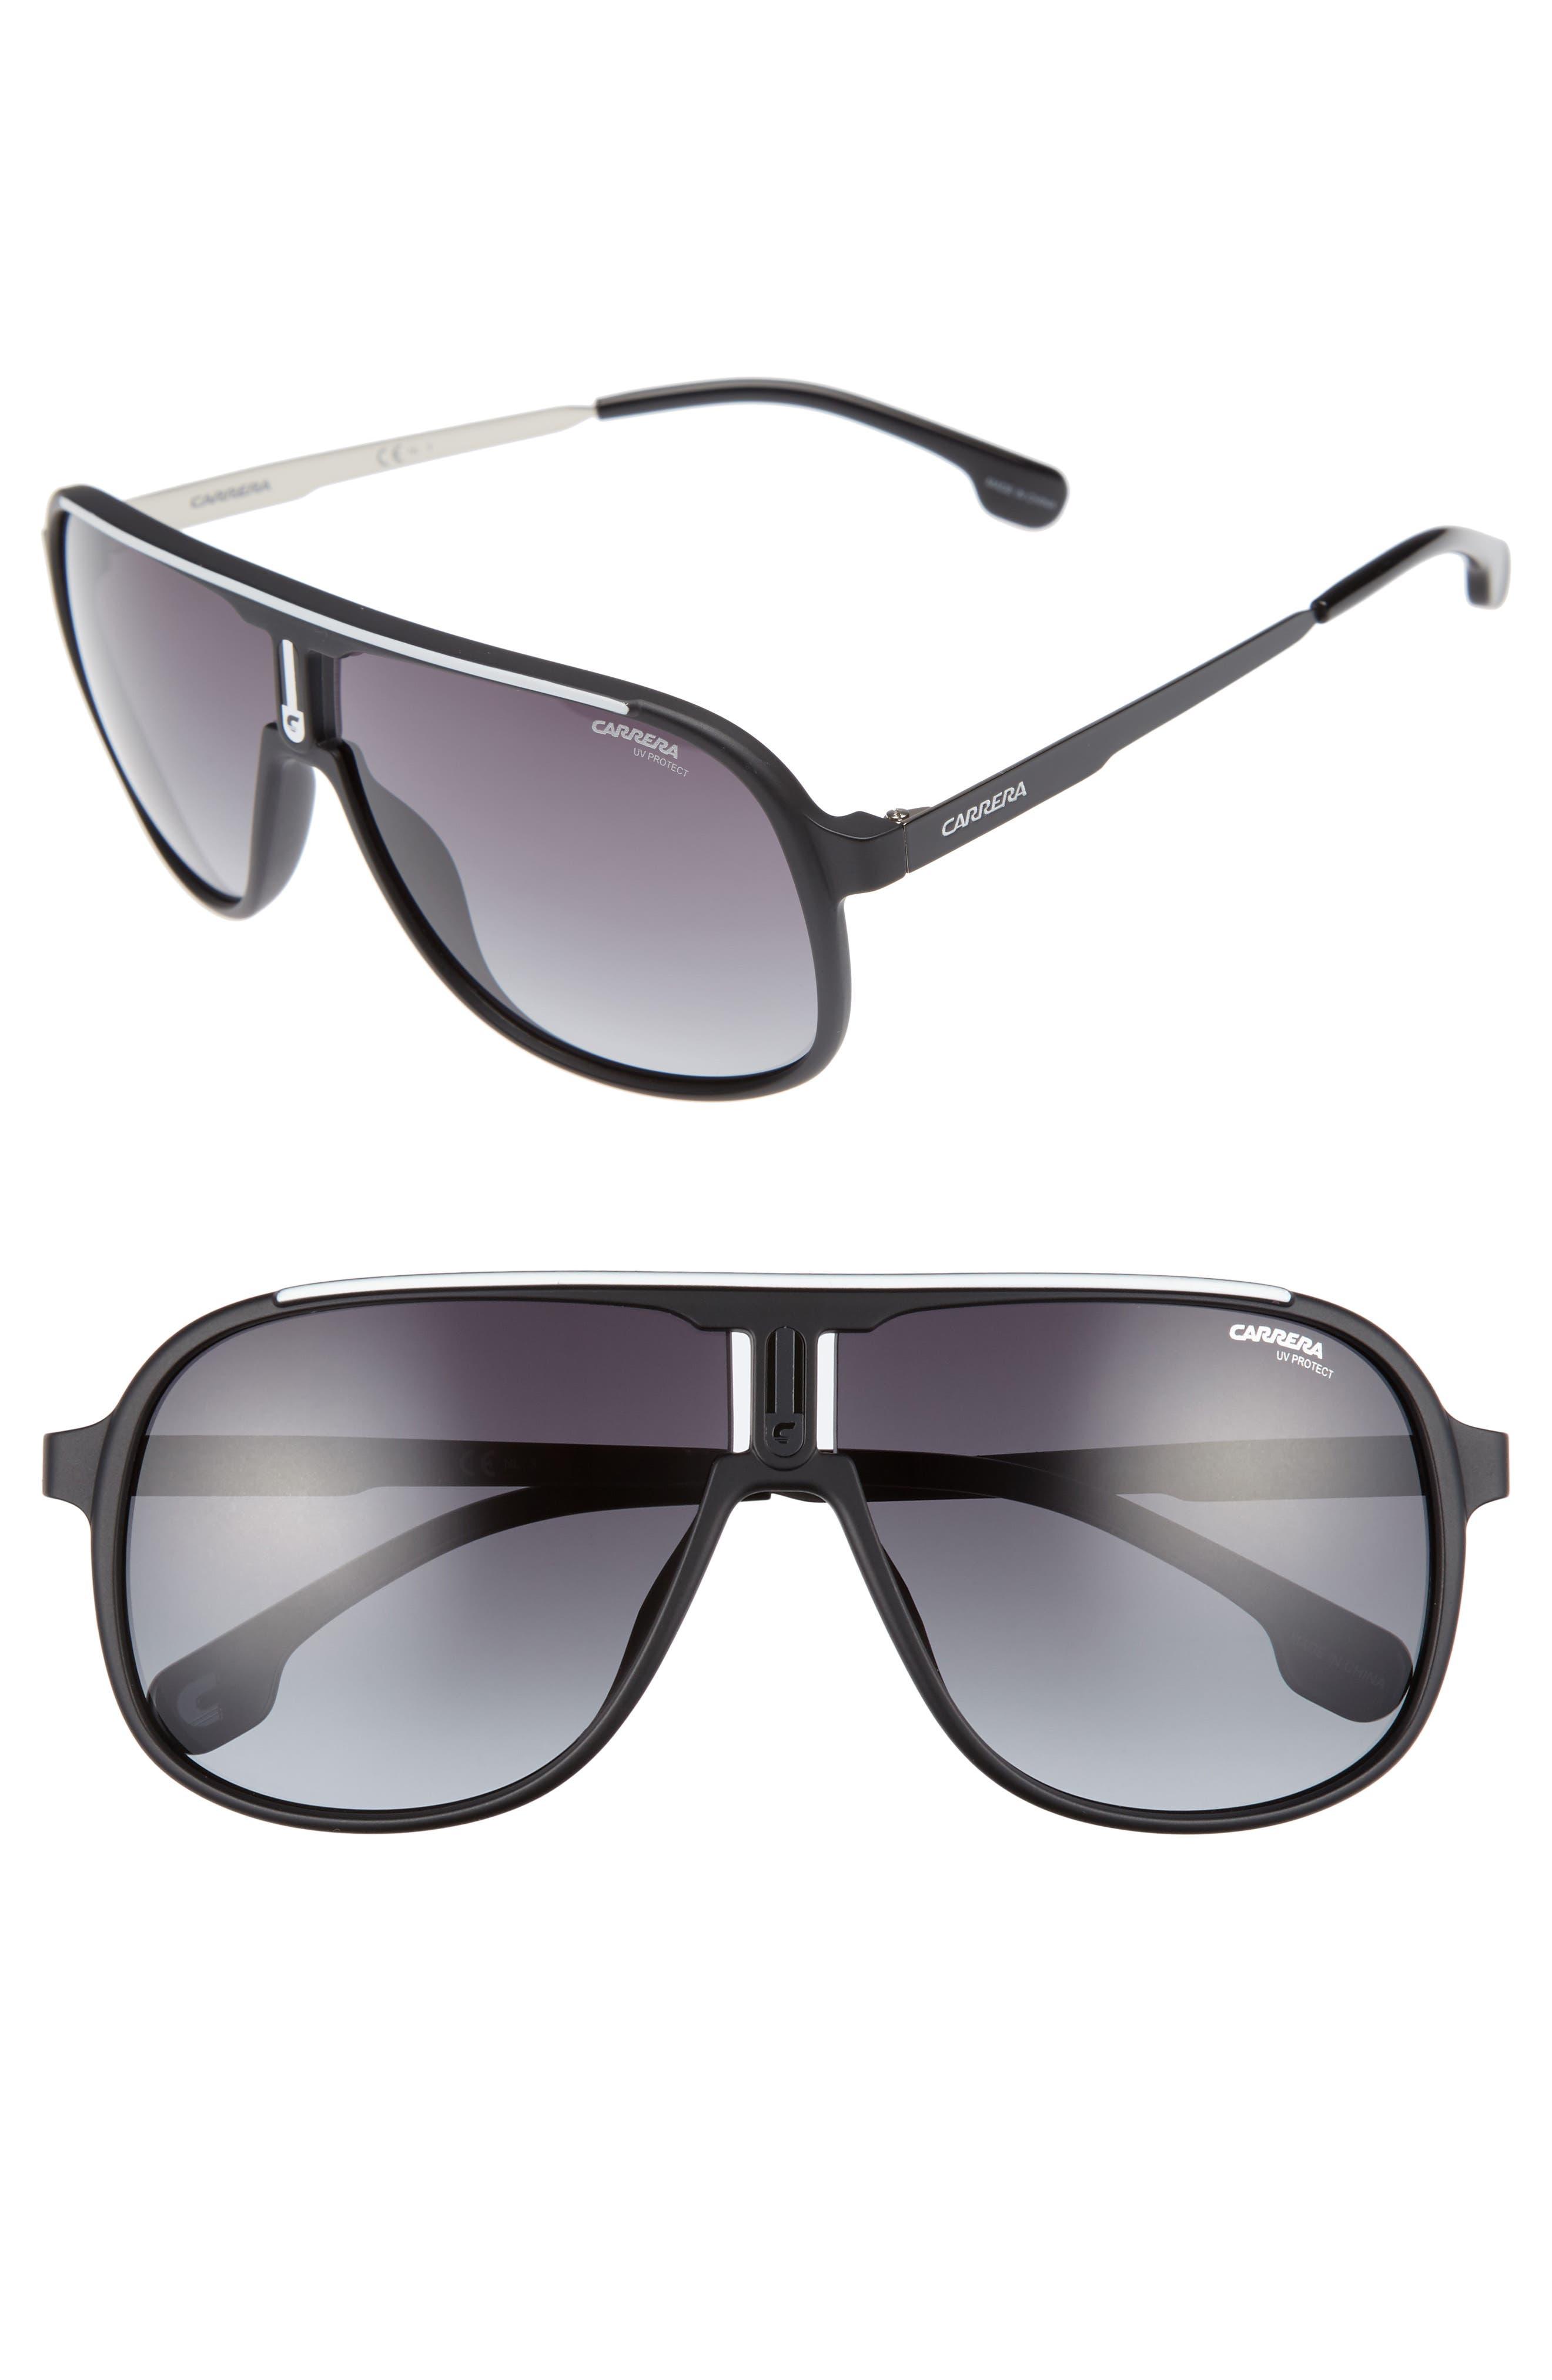 Main Image - Carrera Eyewear 62mm Sunglasses